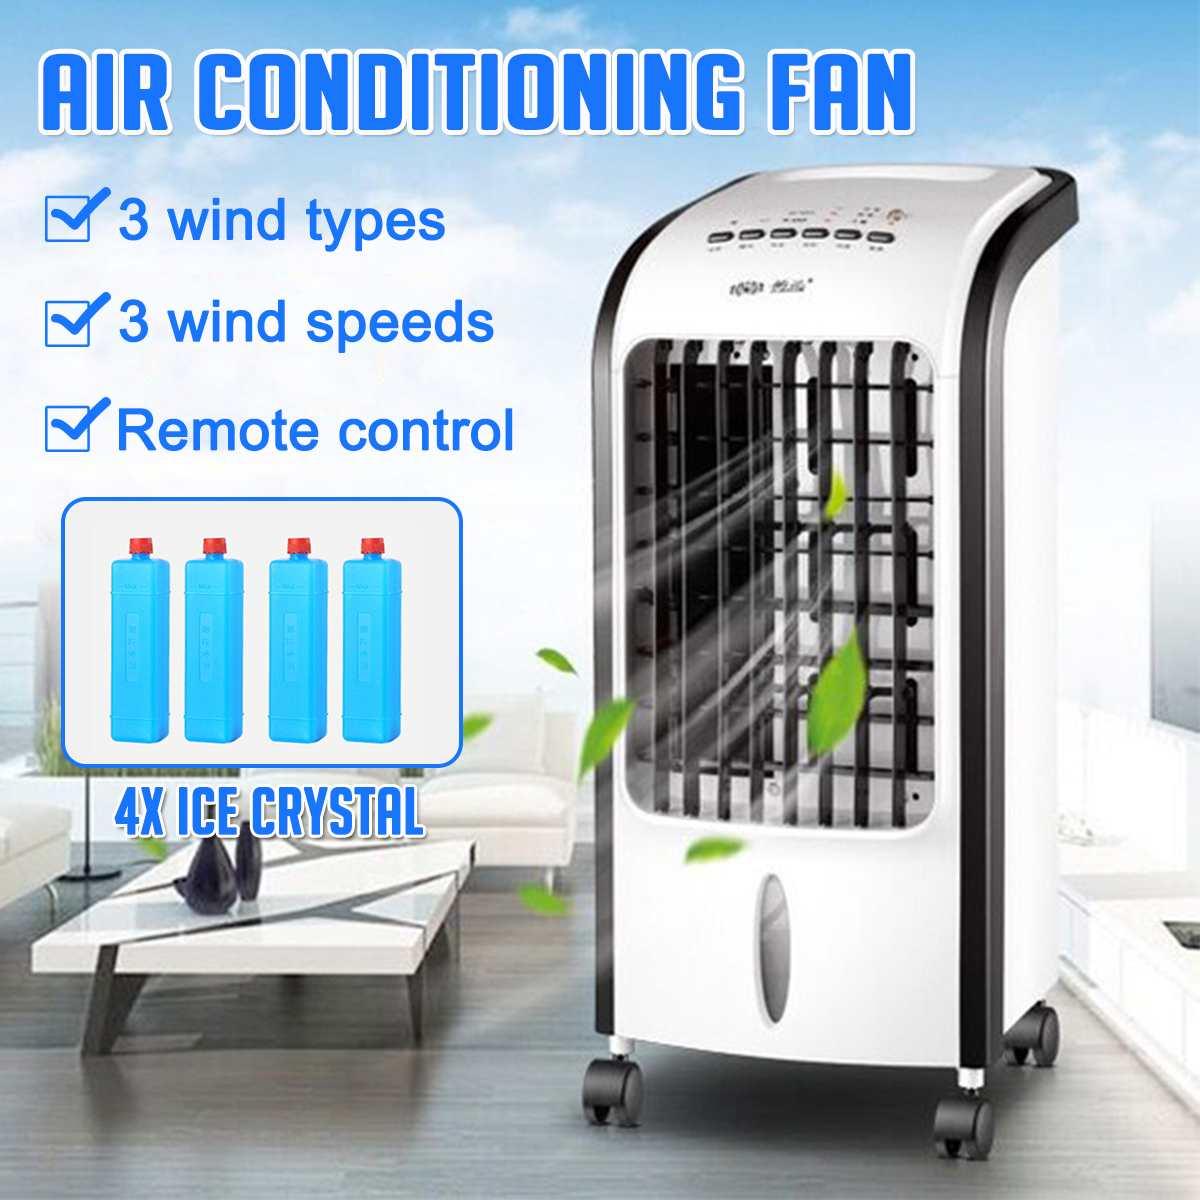 US Plug Portable Air Conditioner Conditioning Fan Humidifier Cooler Cooling 220V Air Conditioner Cooling Fan Humidifier